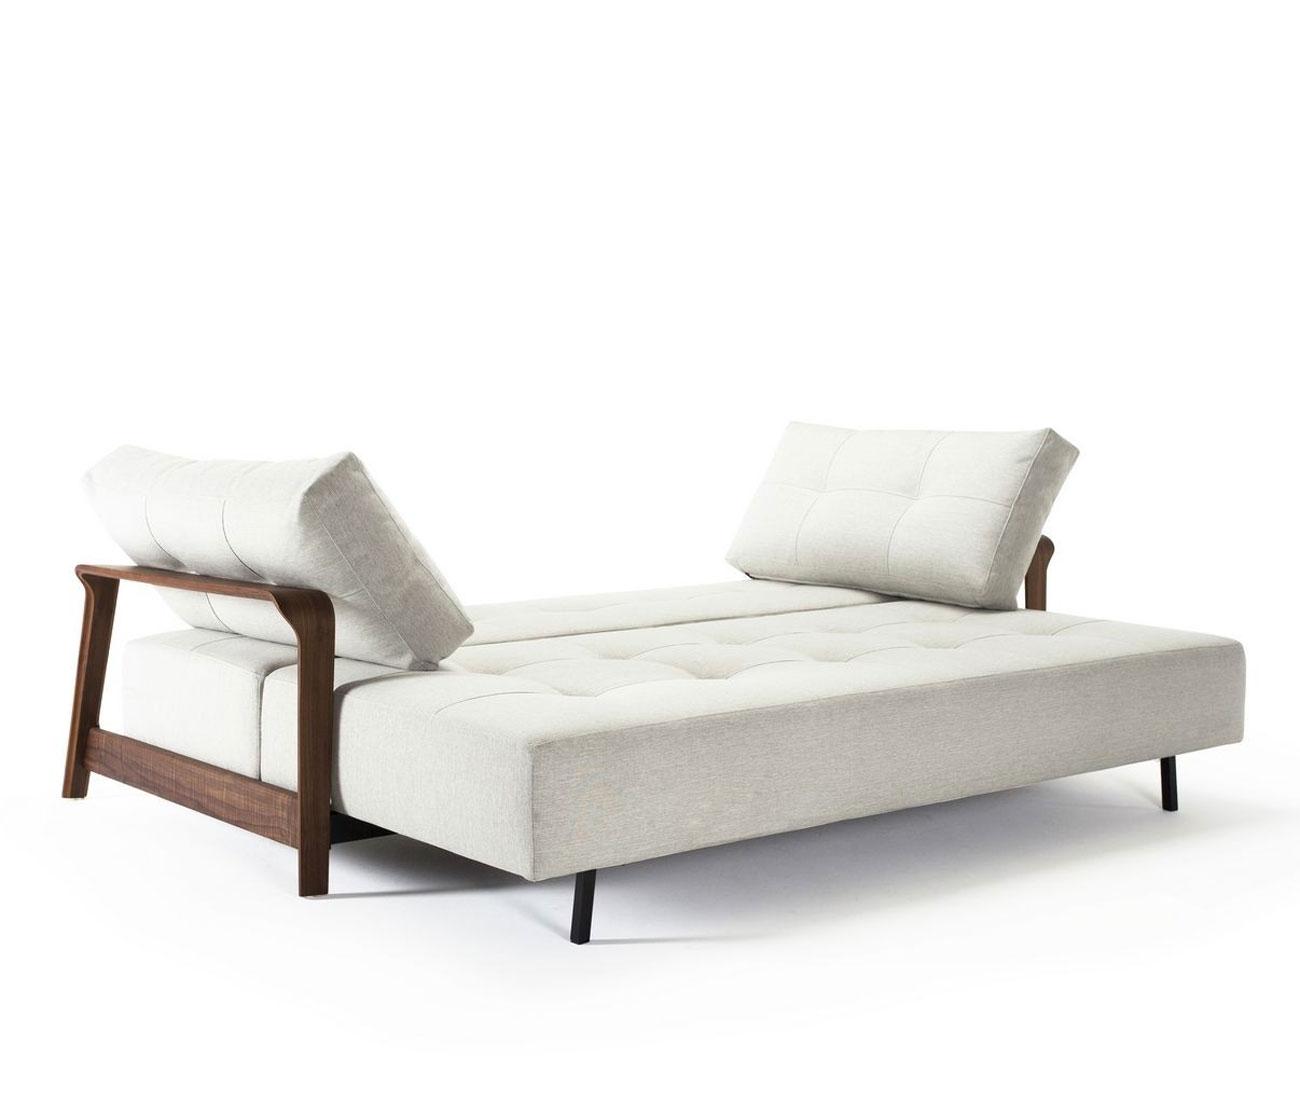 The Sofa Bed Toronto